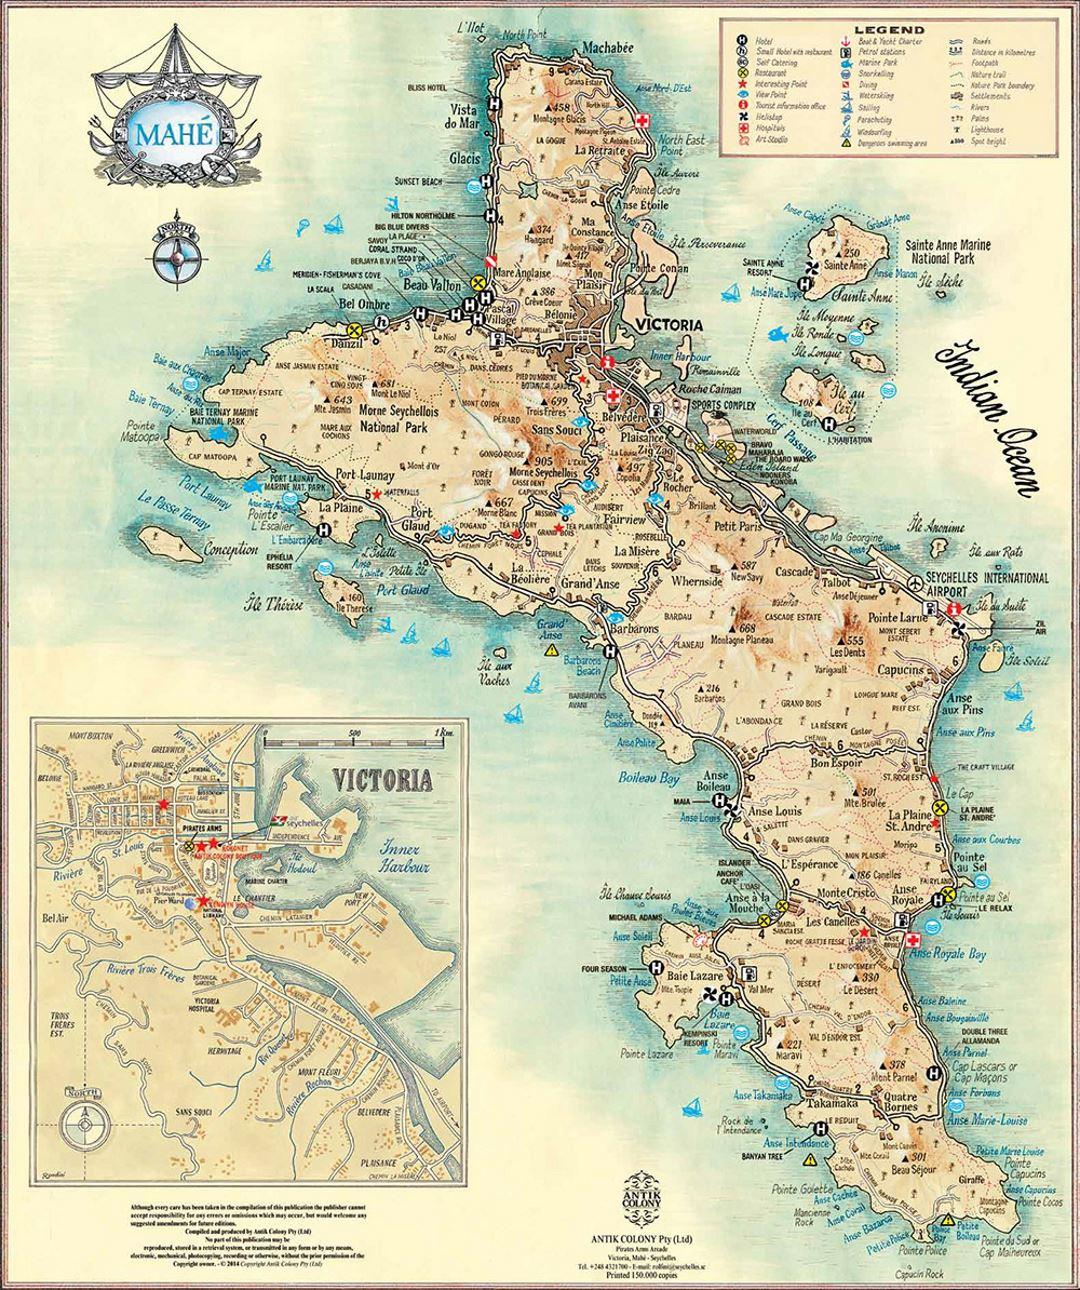 Mahe Island Seychelles Map